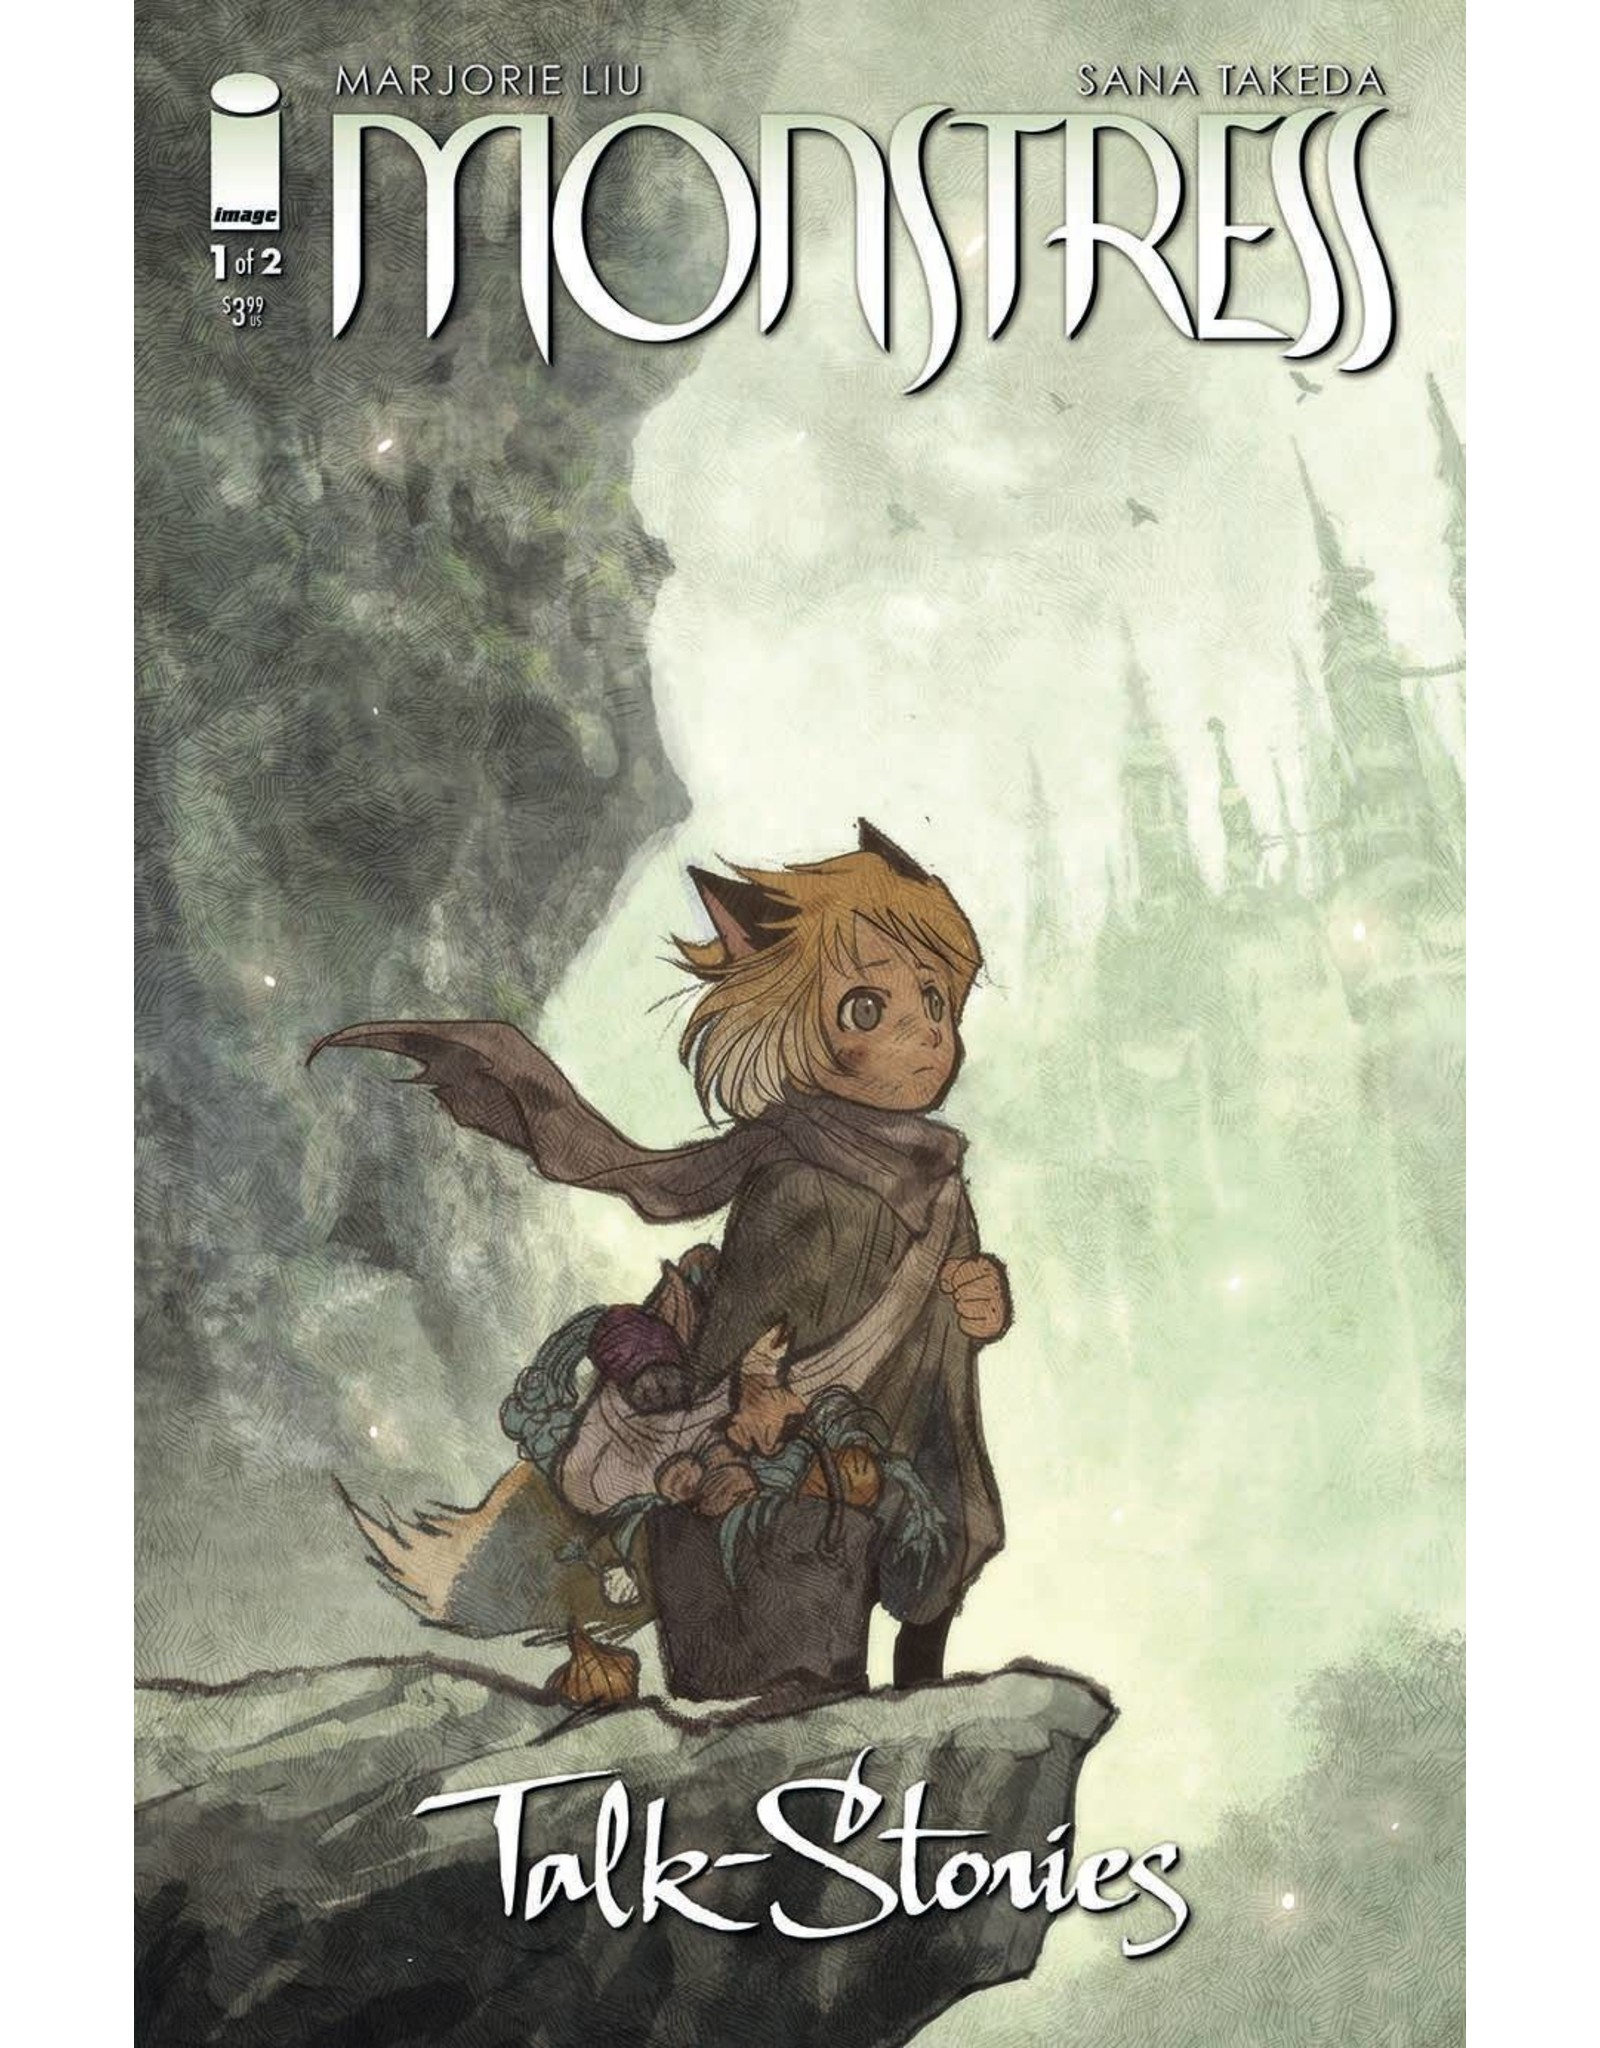 IMAGE COMICS MONSTRESS TALK-STORIES #1 (OF 2)